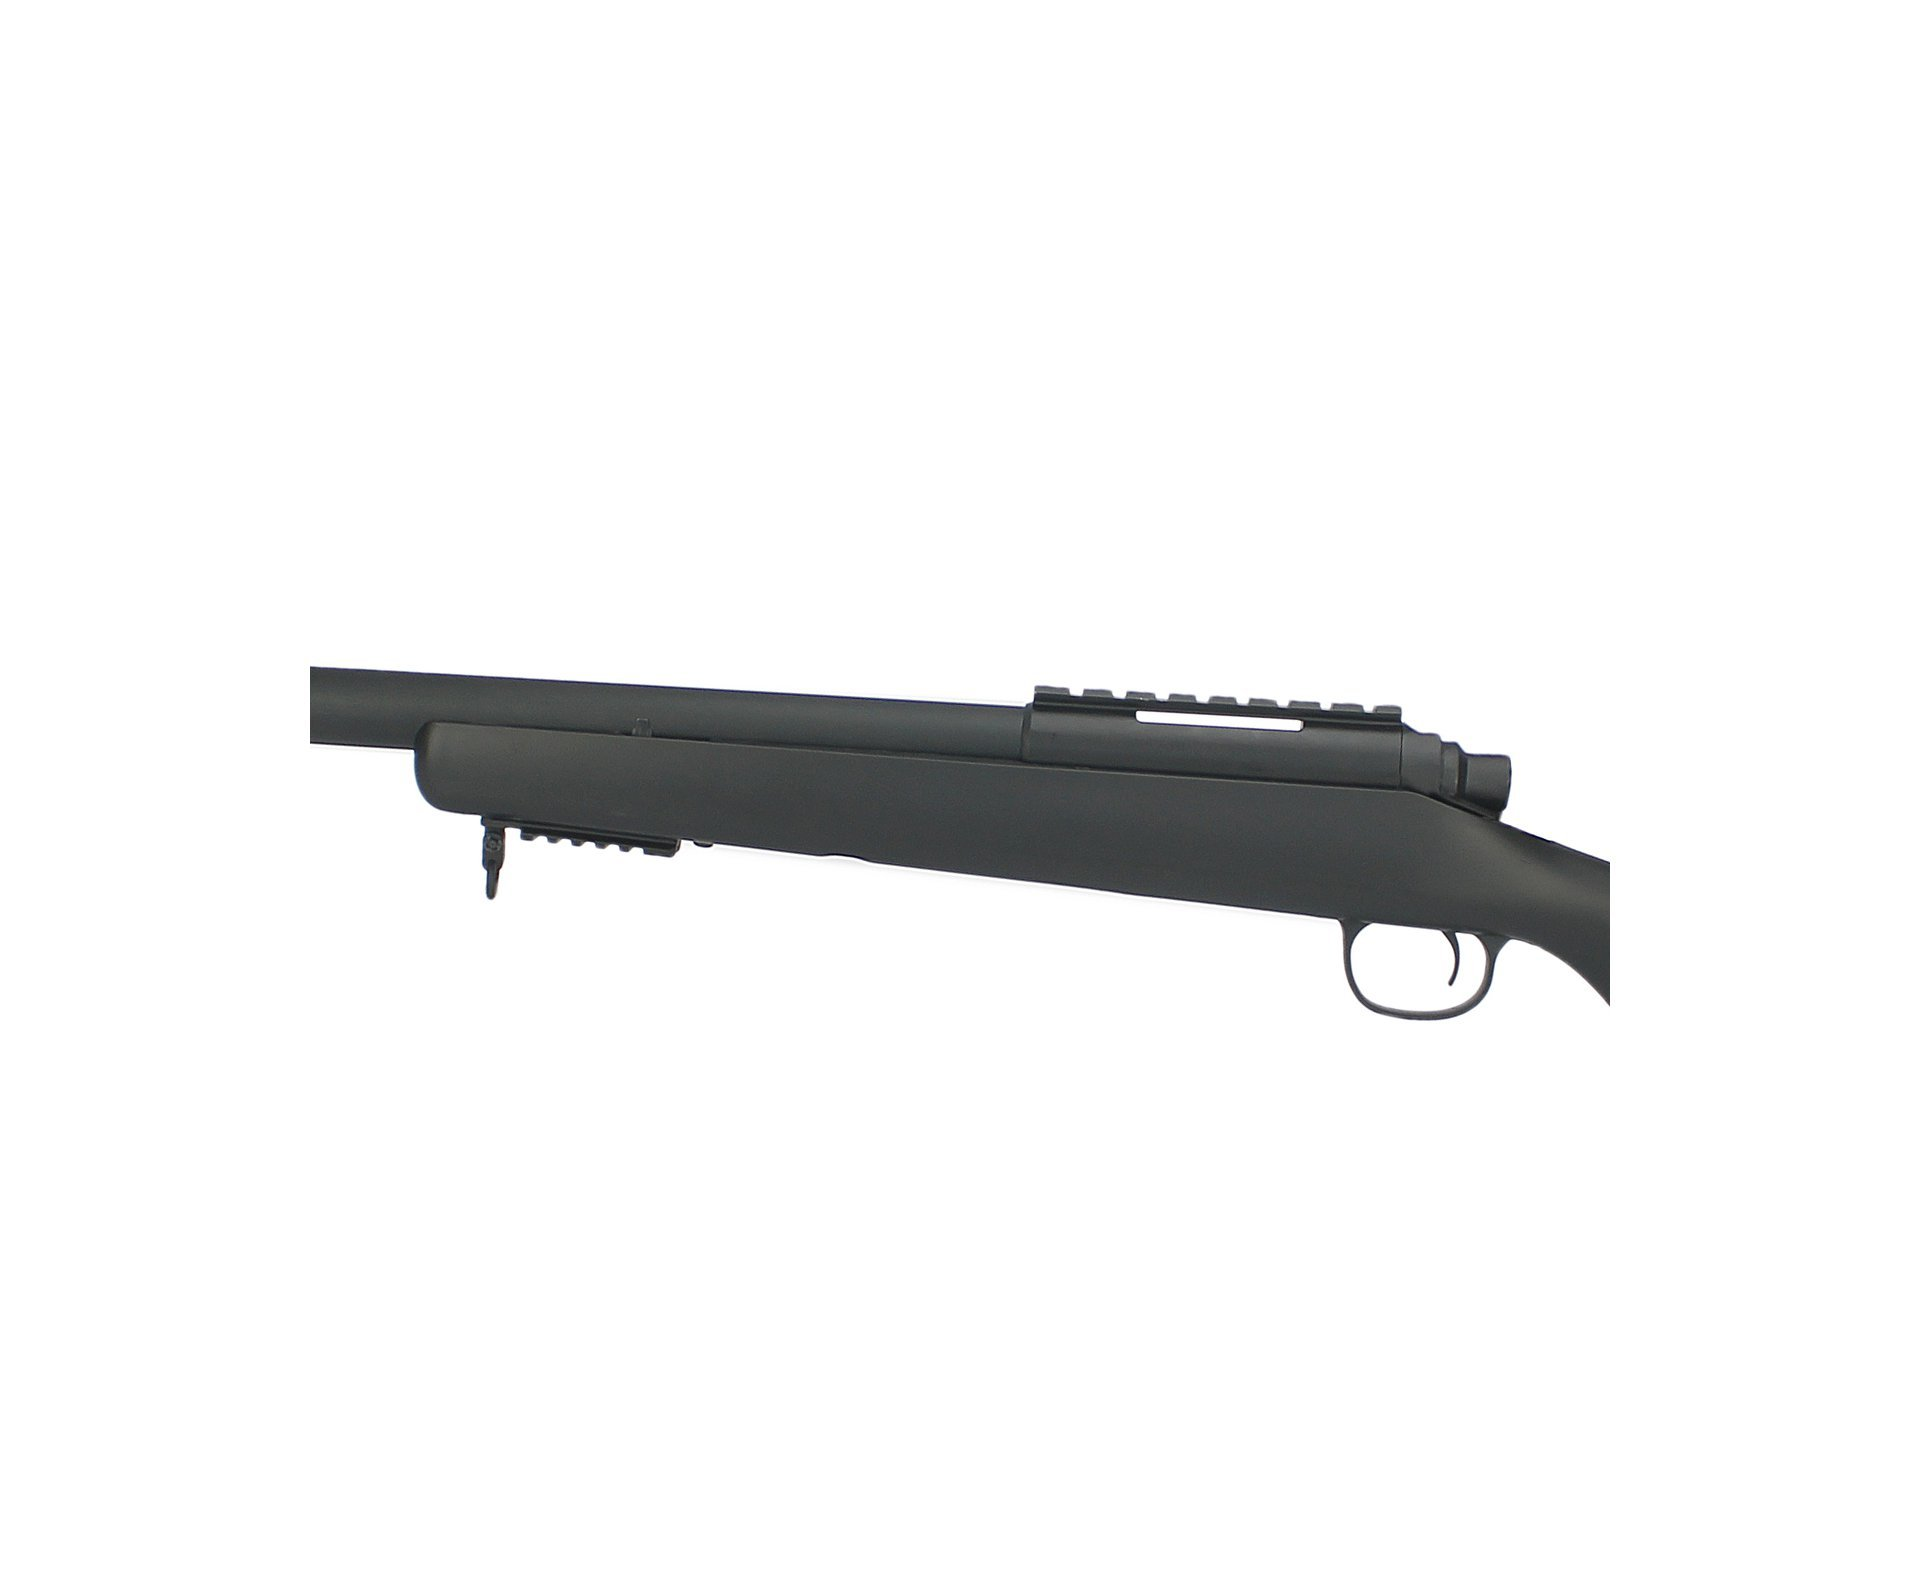 Rifle Sniper De Airsoft Gás Gbb G23b Com Bipé Cal 6,0mm Well